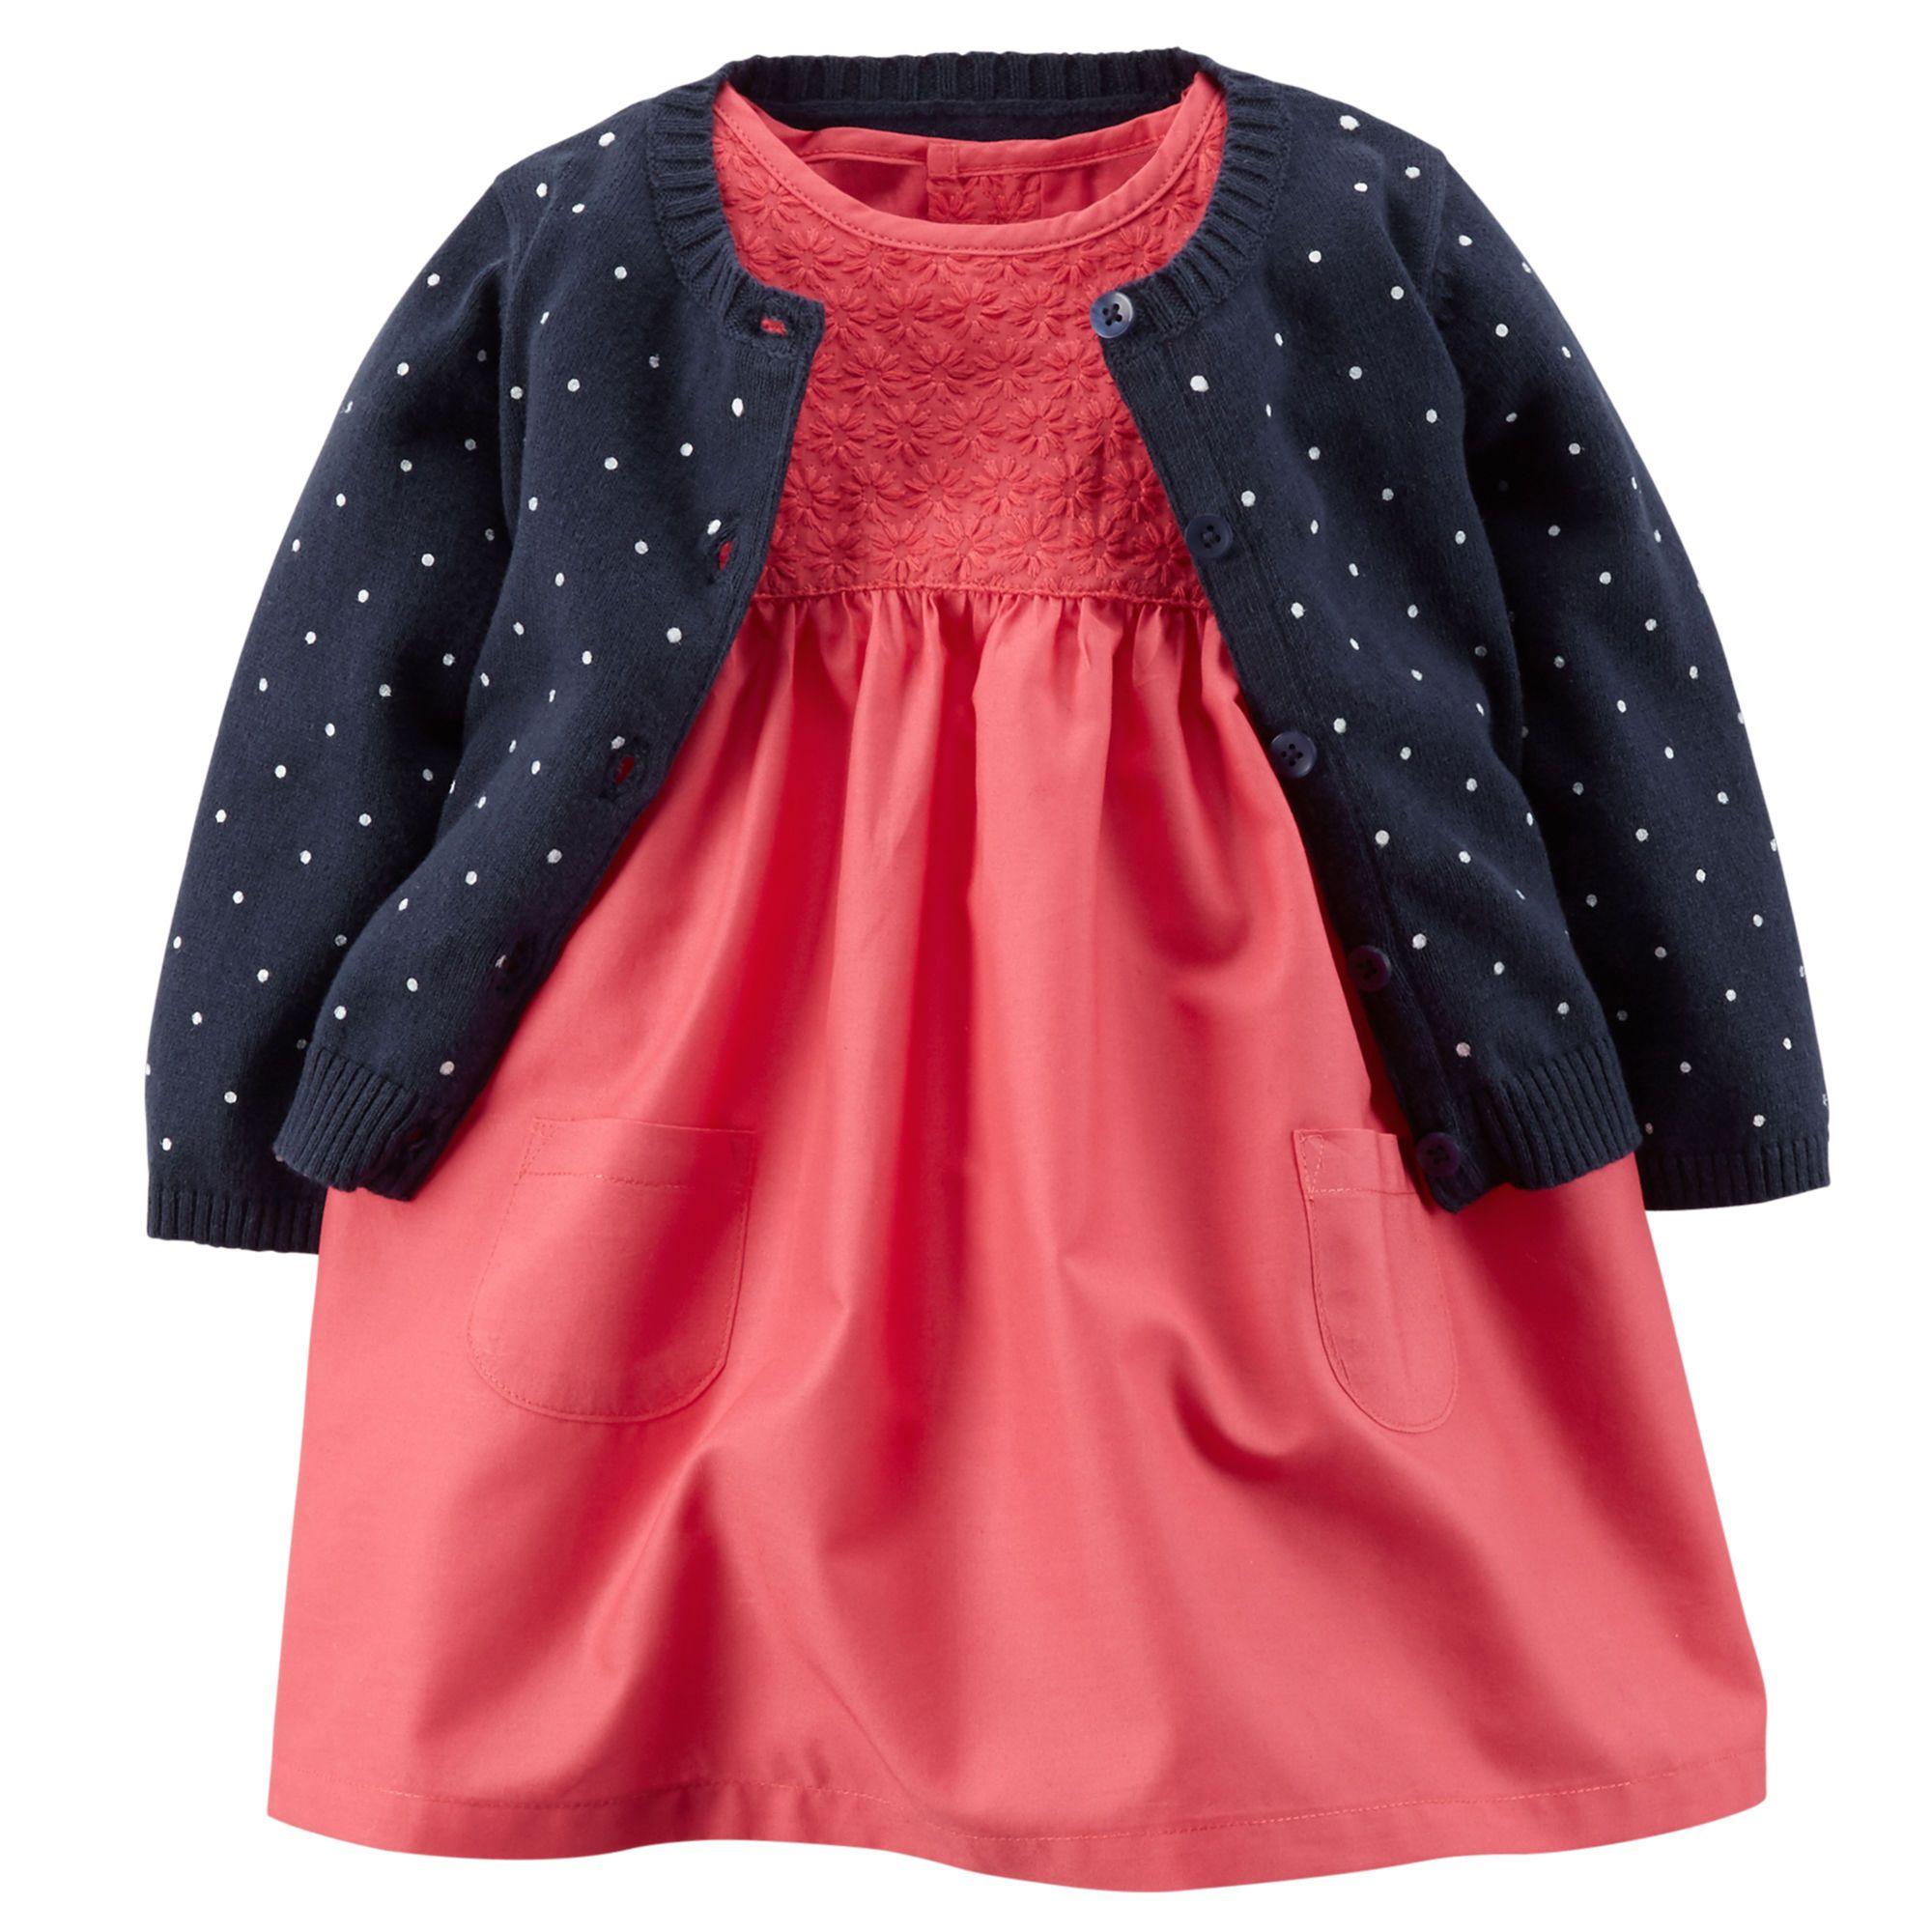 2 Piece Eyelet Lace Dress & Sweater Set